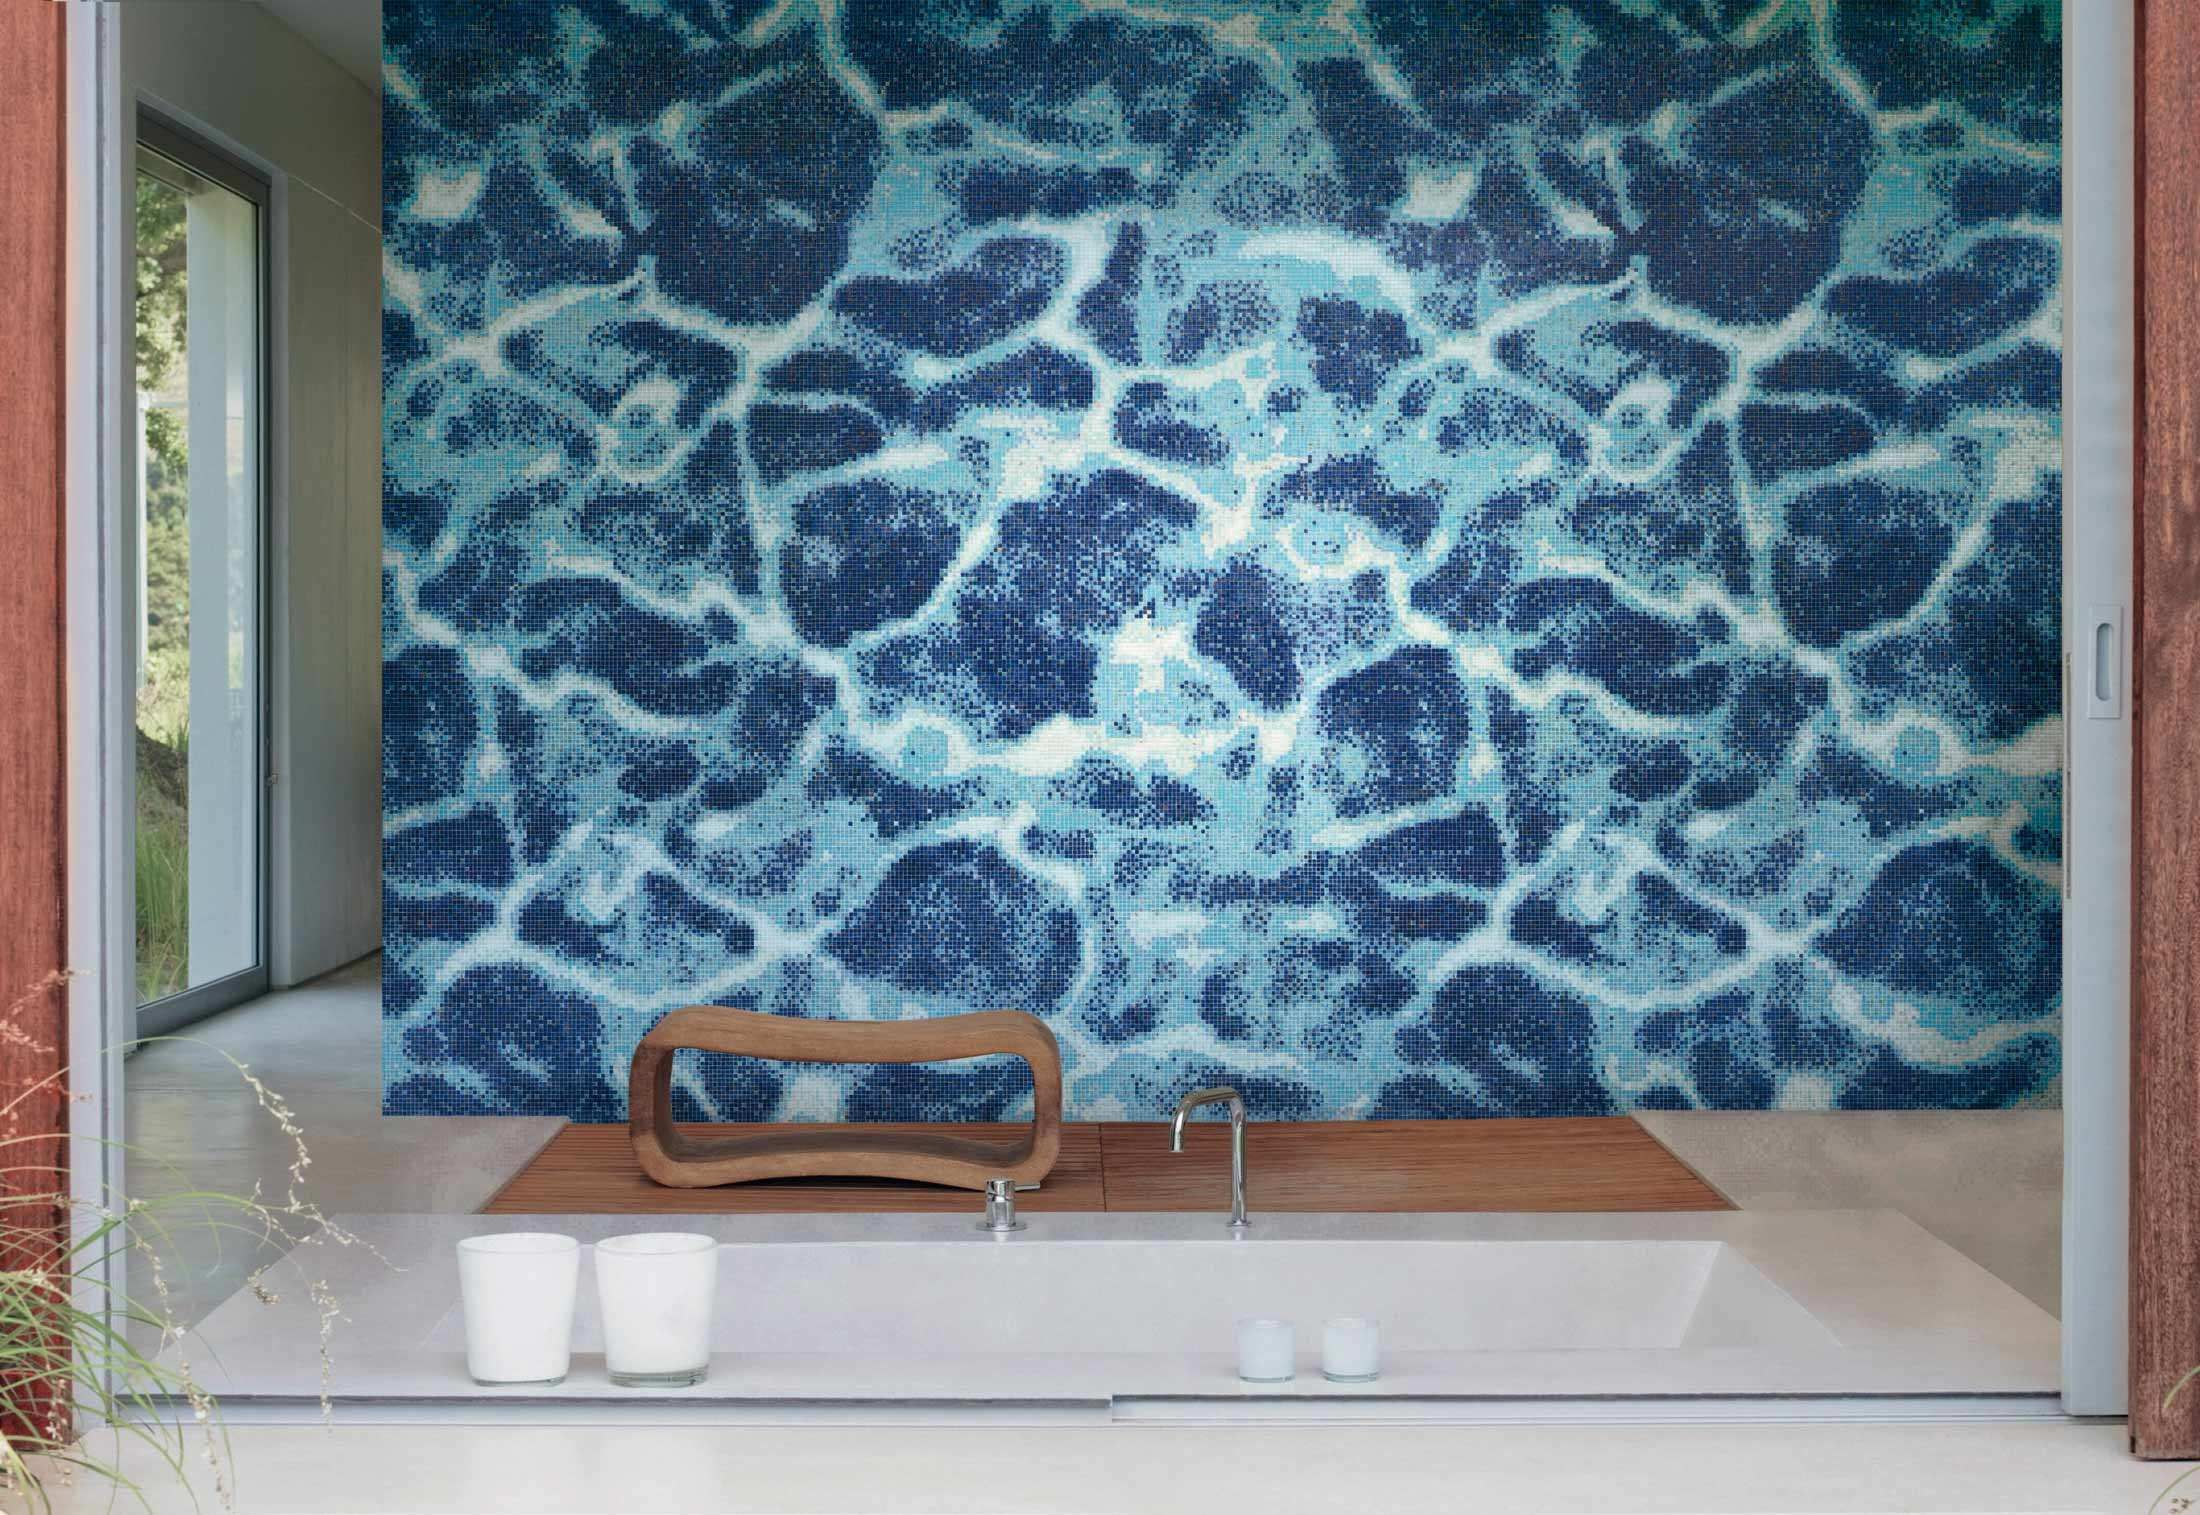 Magnificent Uberhaus Shower Faucet Illustration - Faucet Collections ...